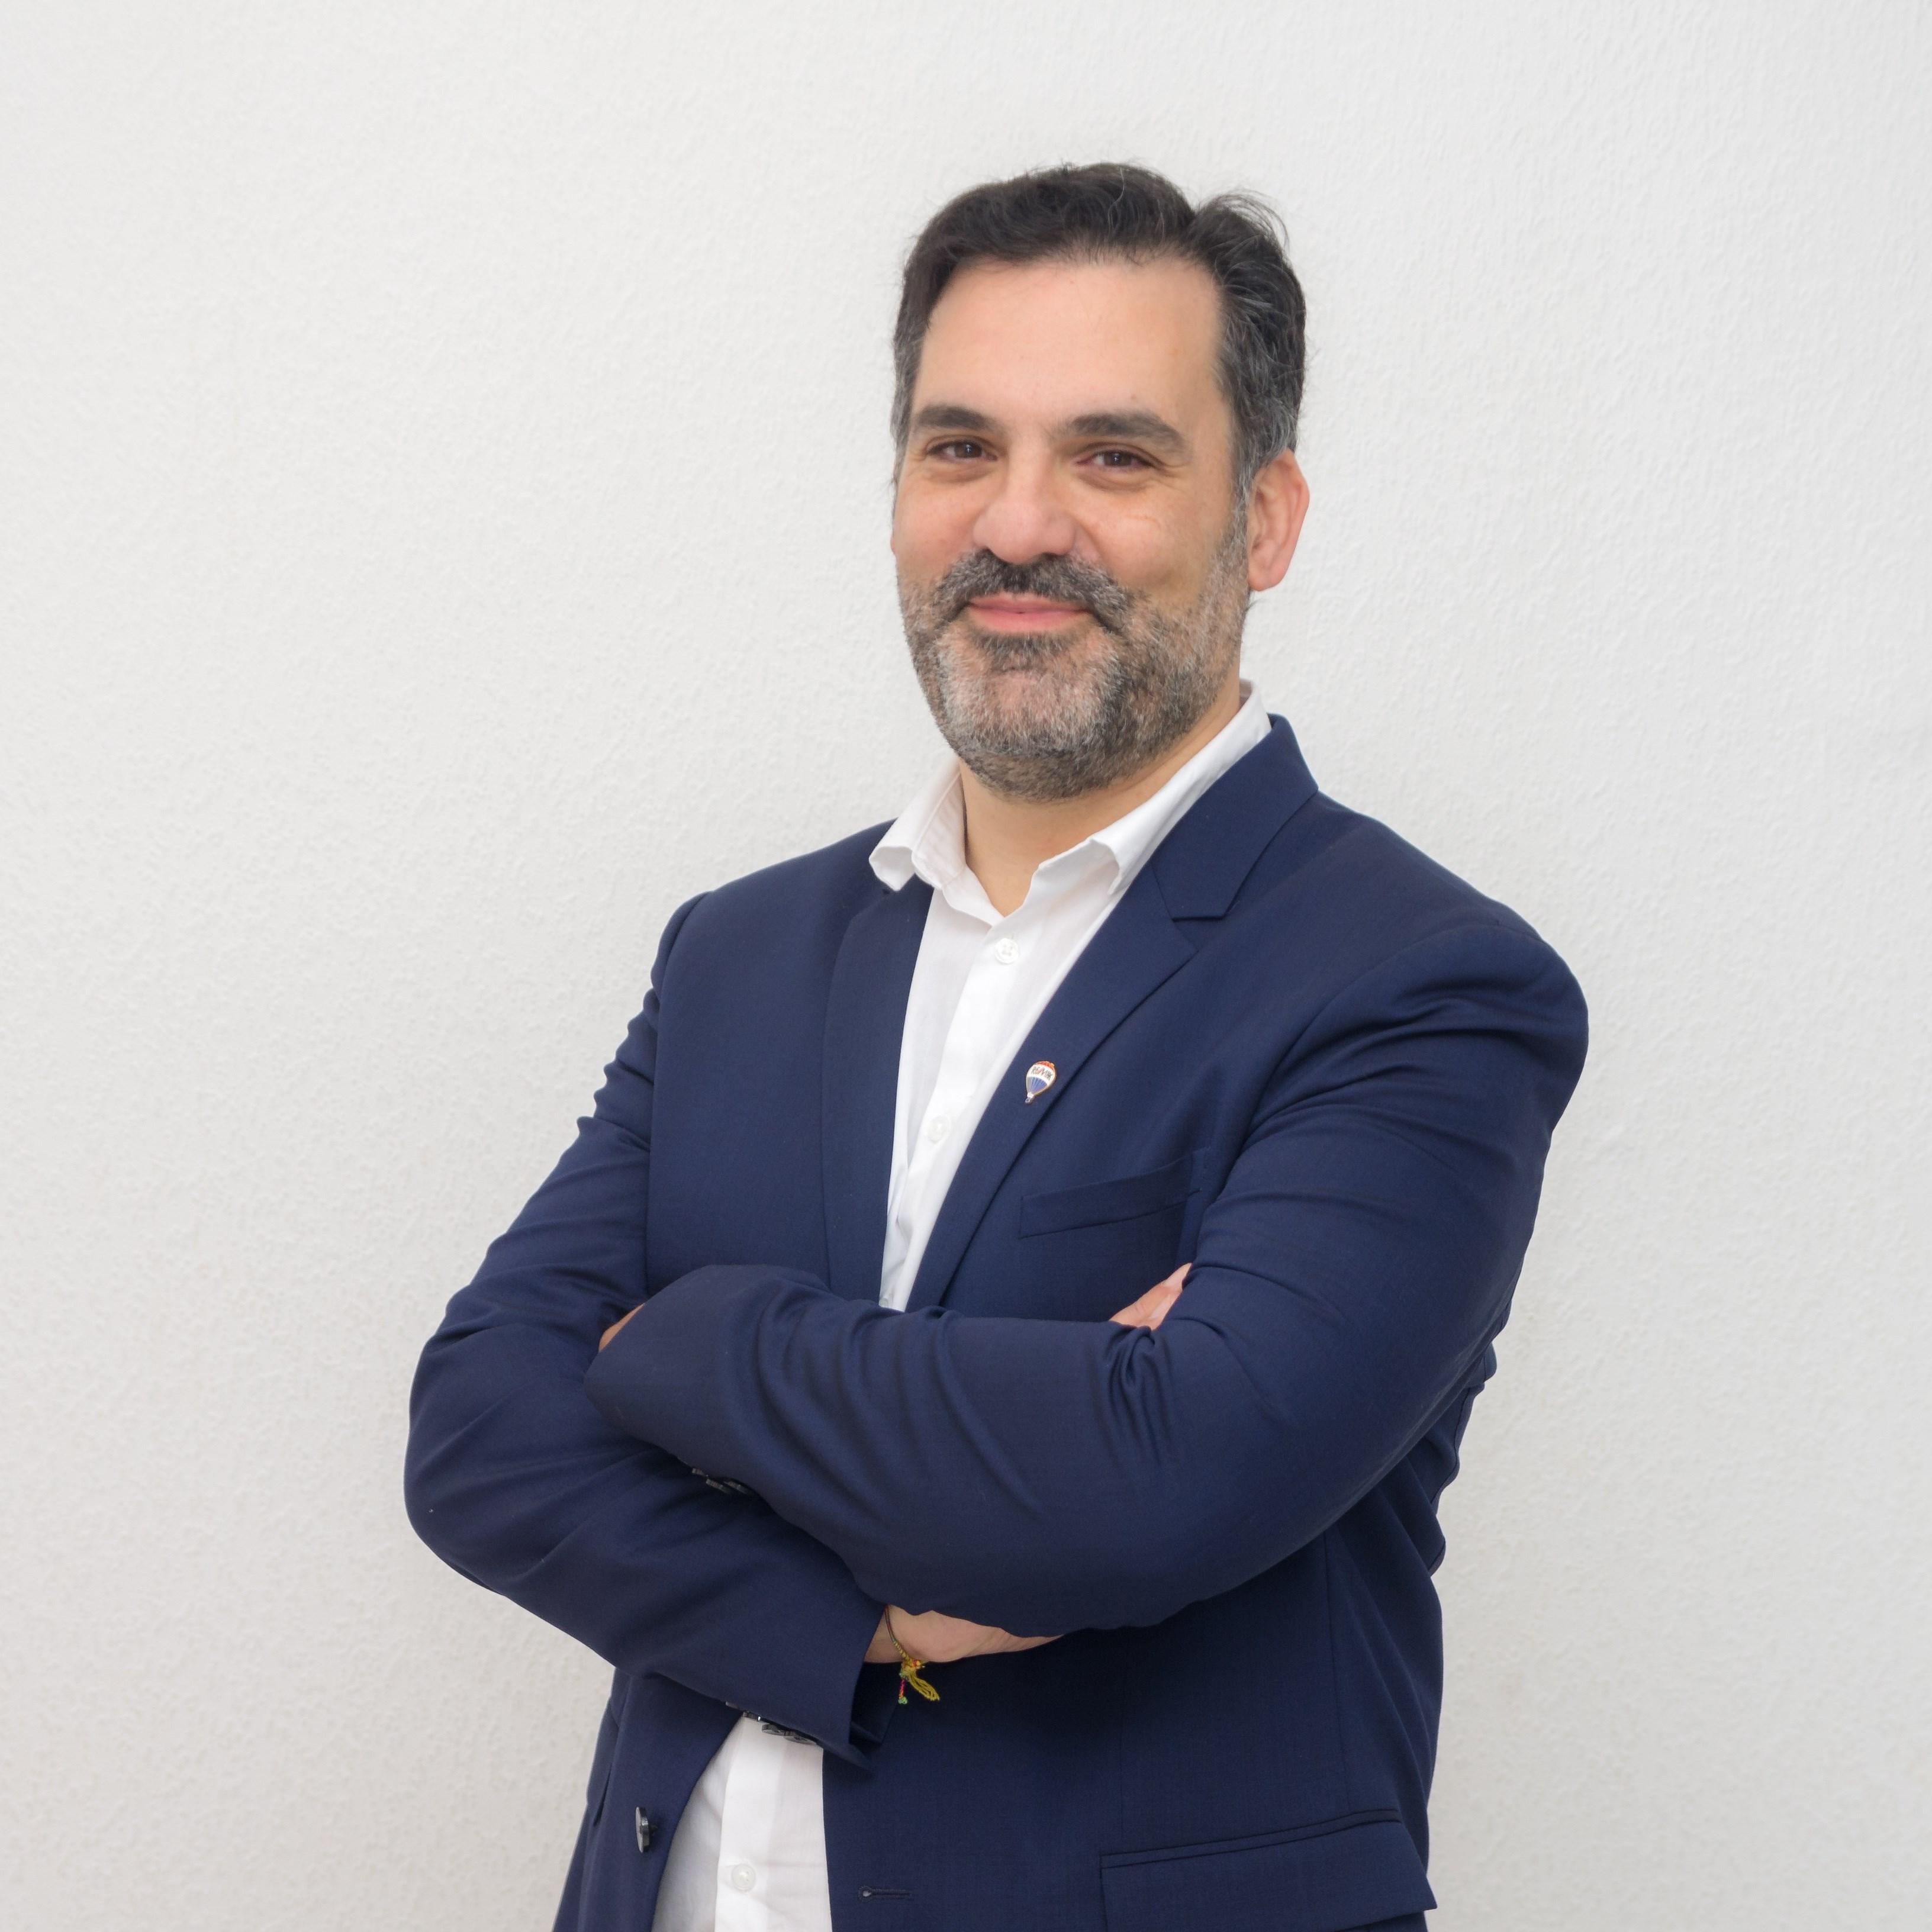 Marcos Souto Martínez